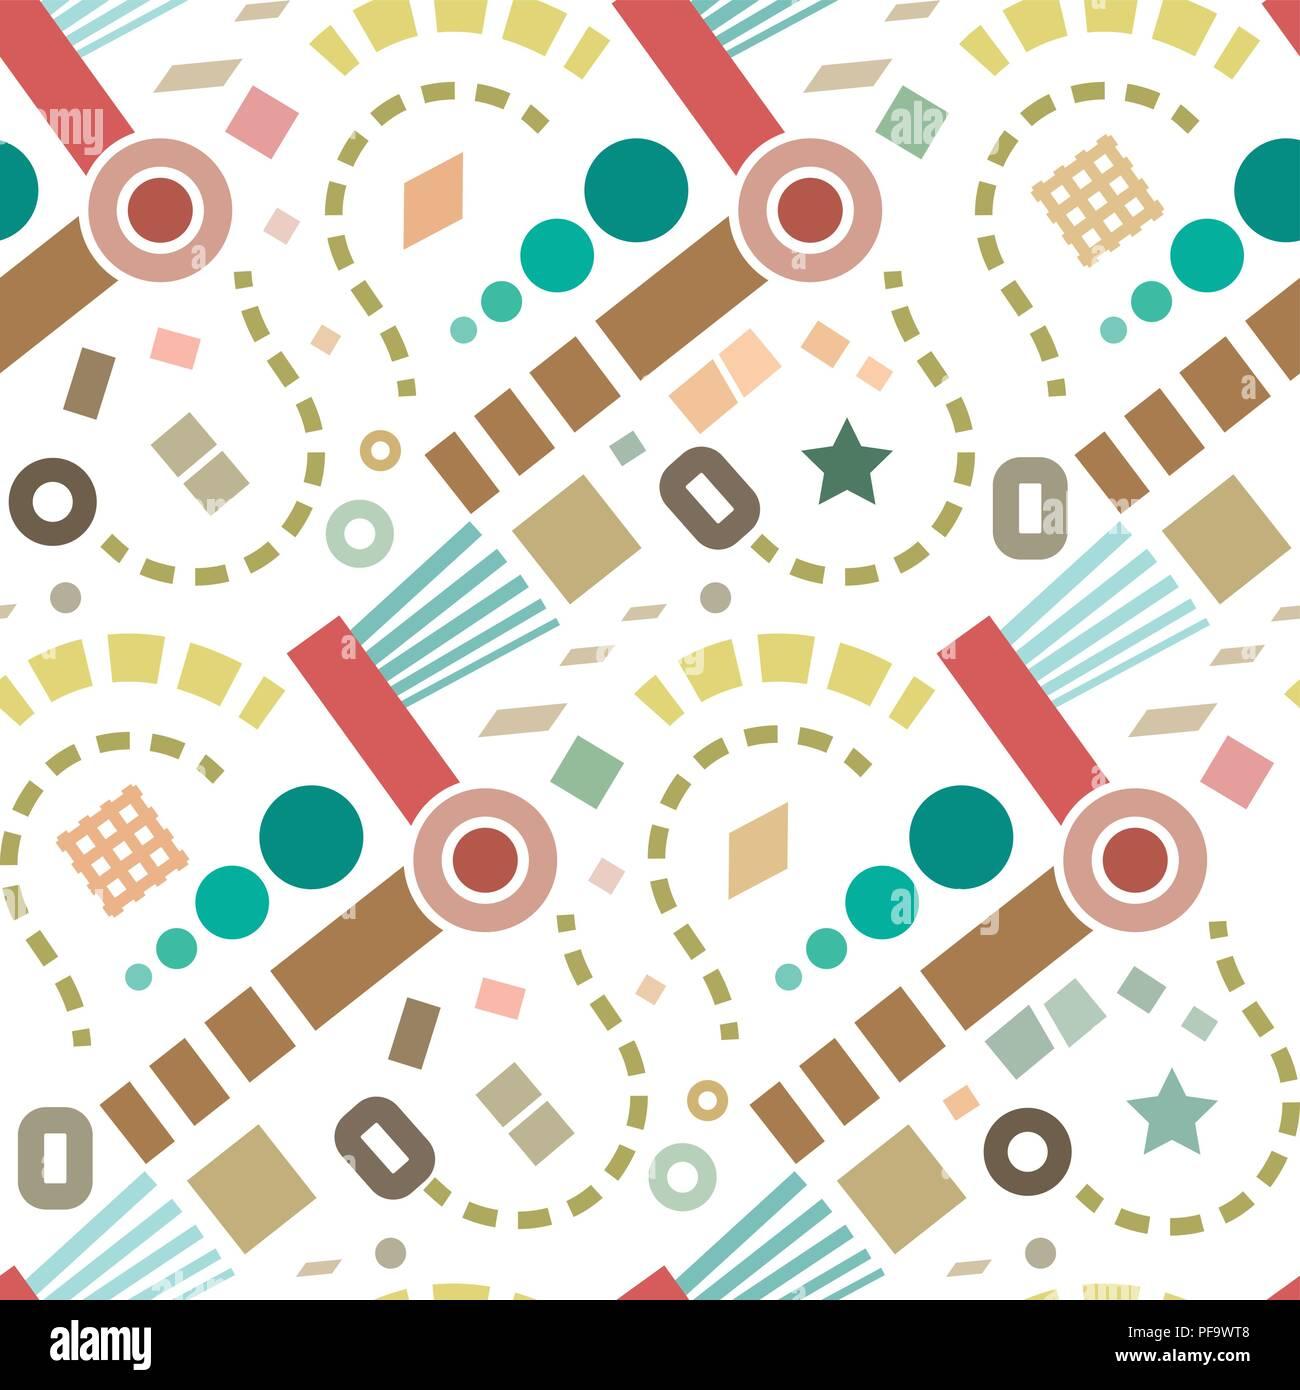 Vector Retro abstract pattern background. Illustration de Vecteur